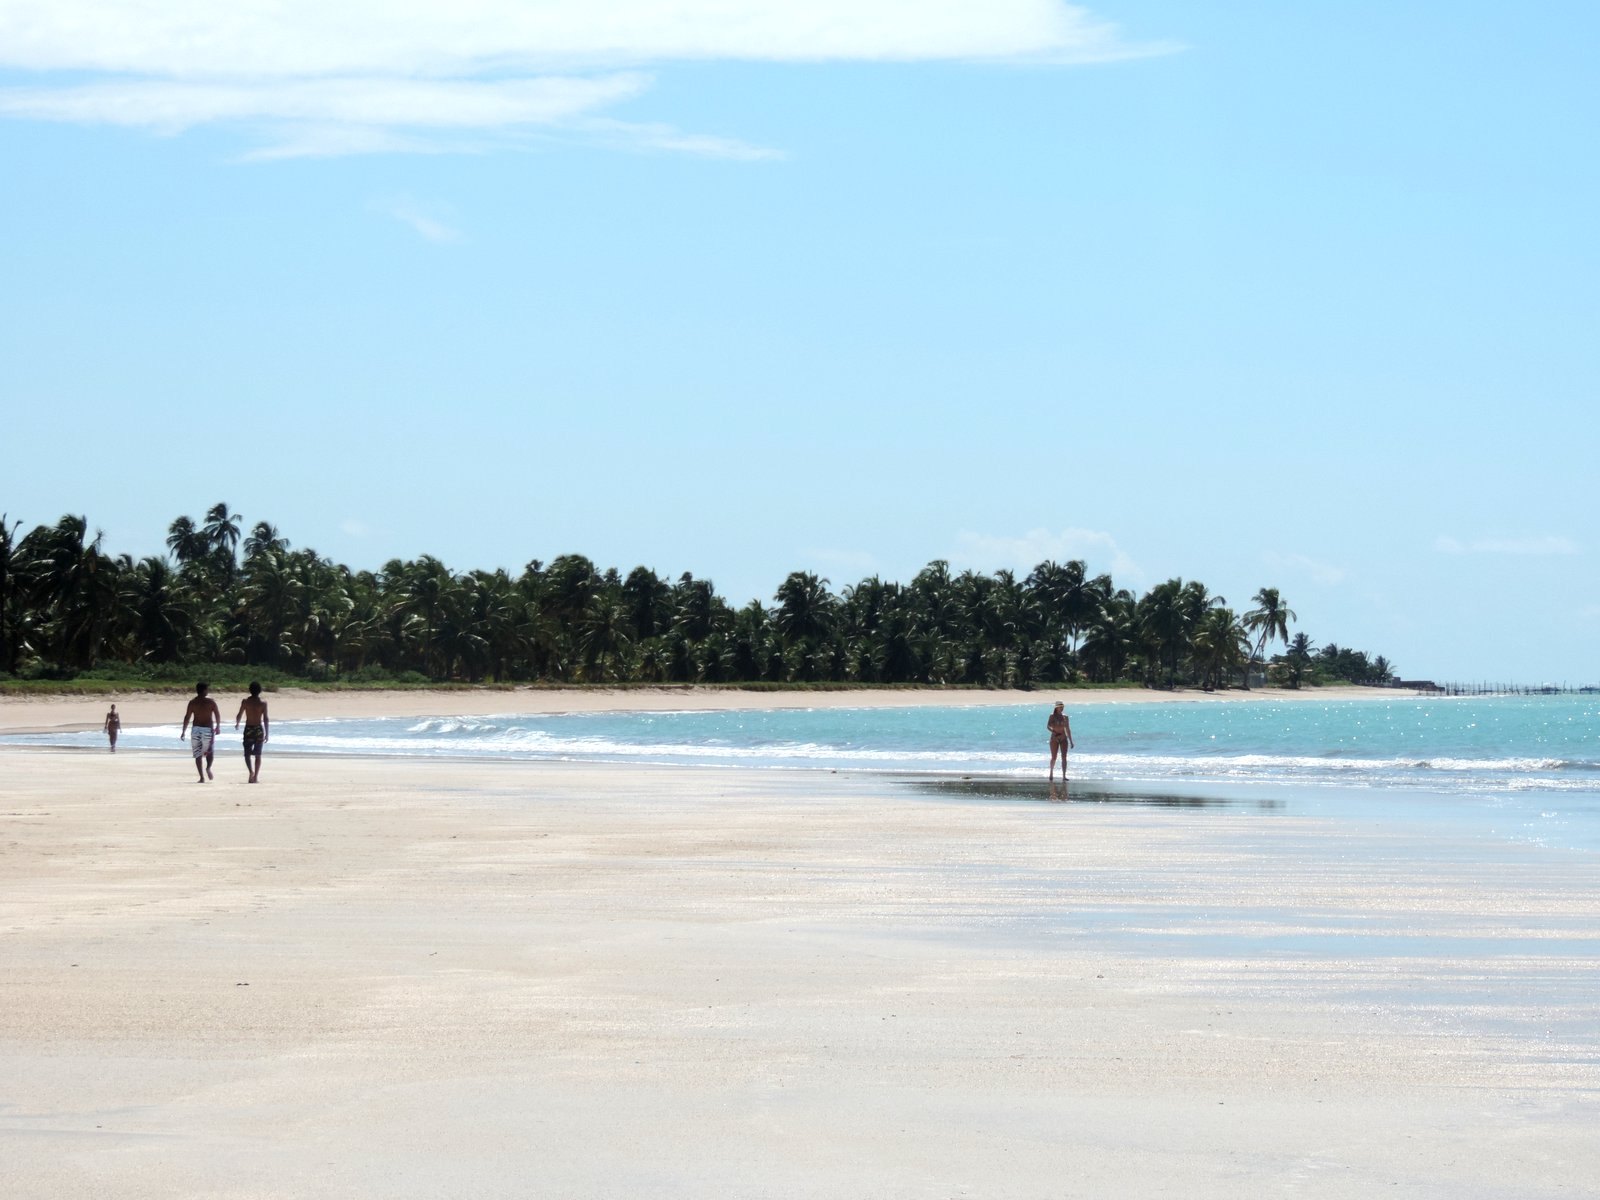 Praia de Ipioca - Maceió.